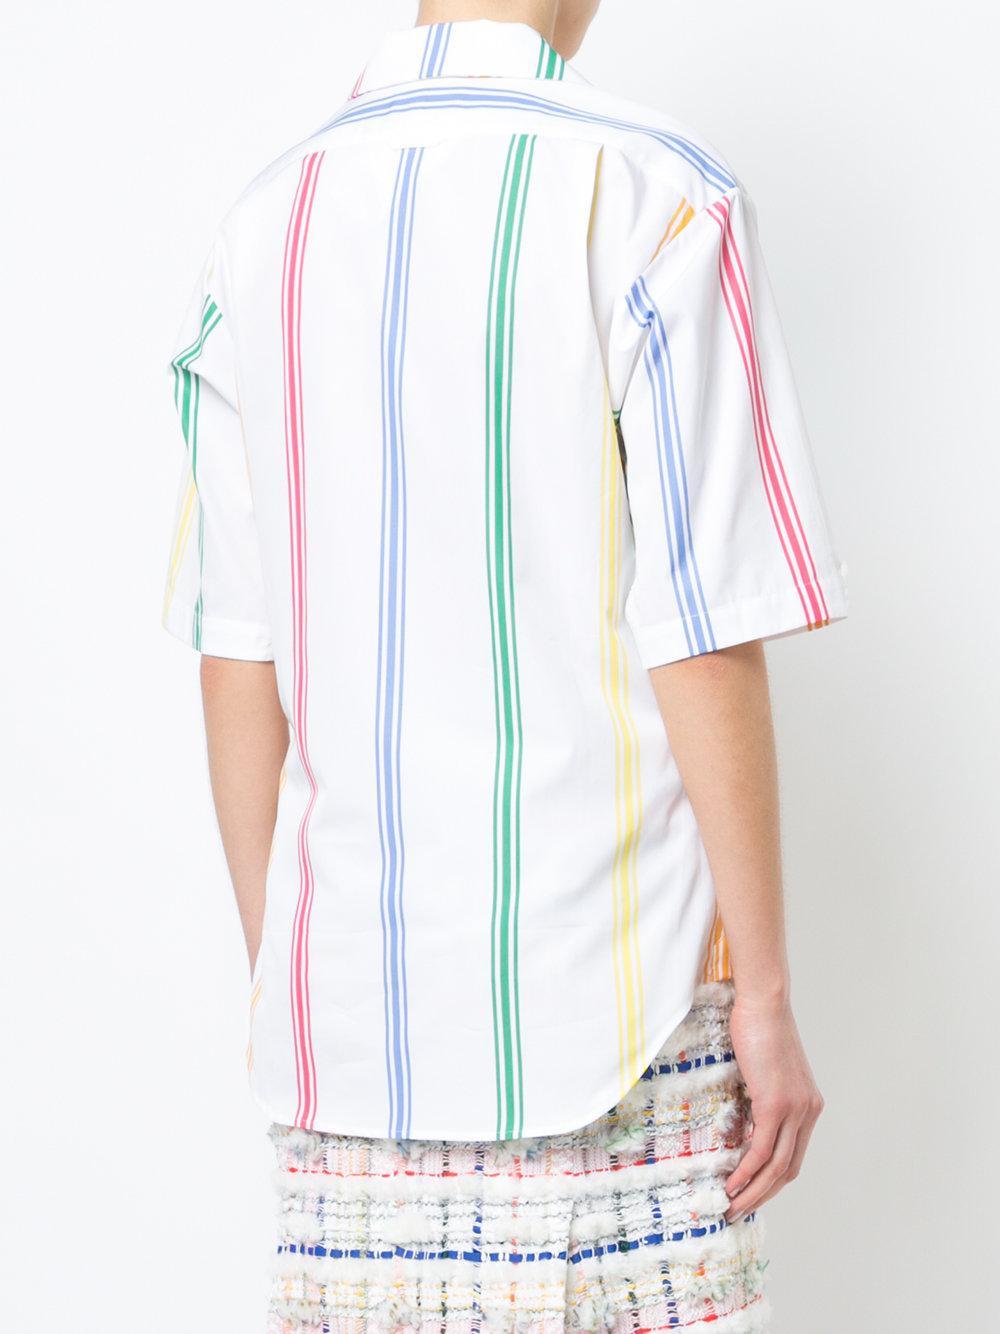 Cuban Polo Collar Blouse In Small Mods Stripe Poplin - Grey Thom Browne Wear Resistance Find Great Cheap Price K38WTEb10